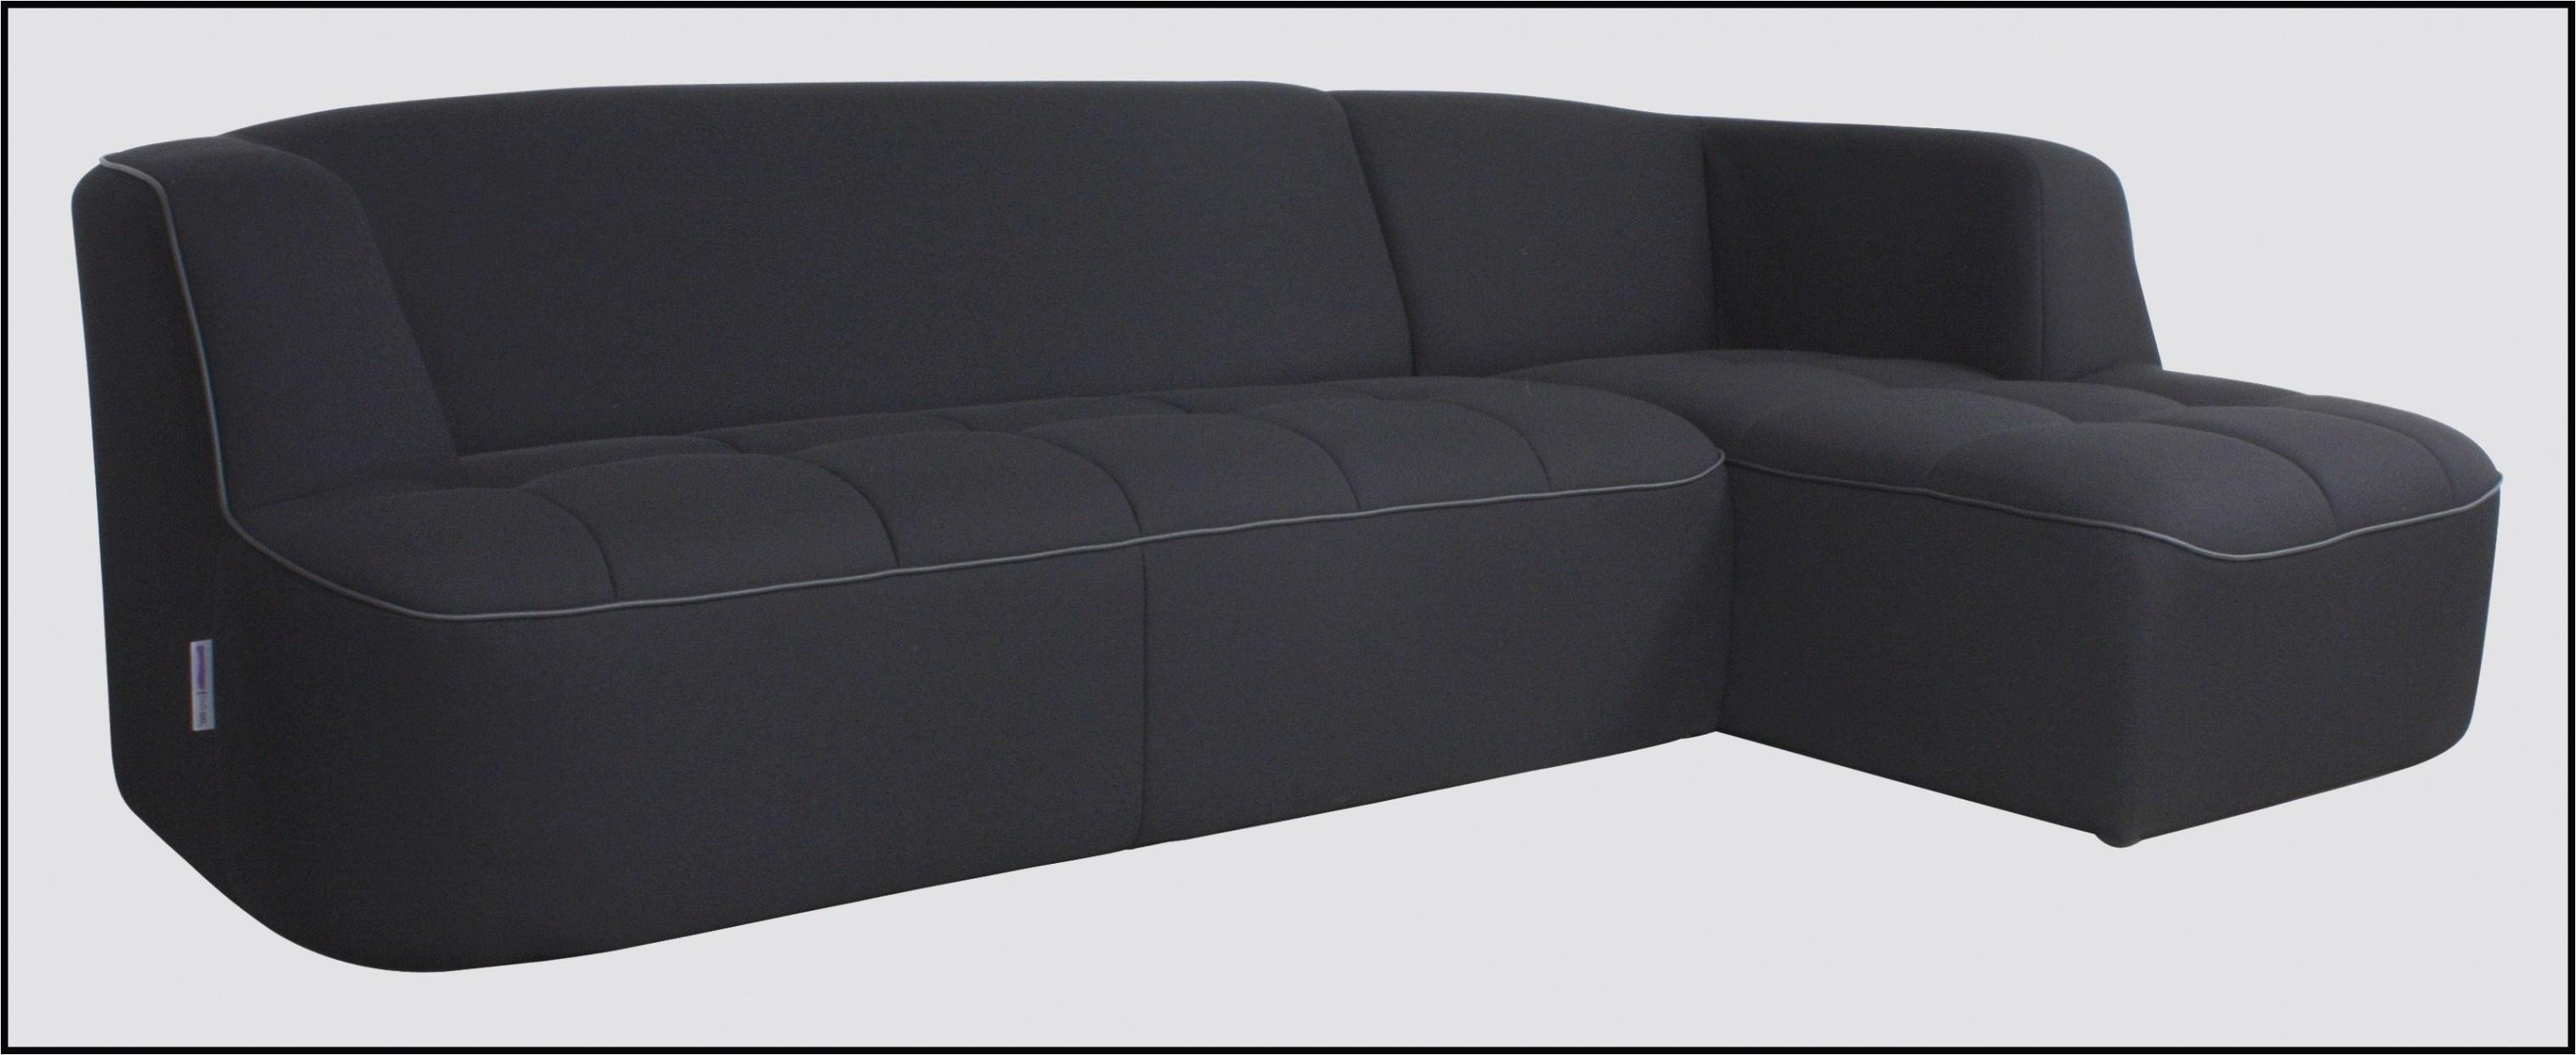 Canapé d'angle pas cher le bon coin